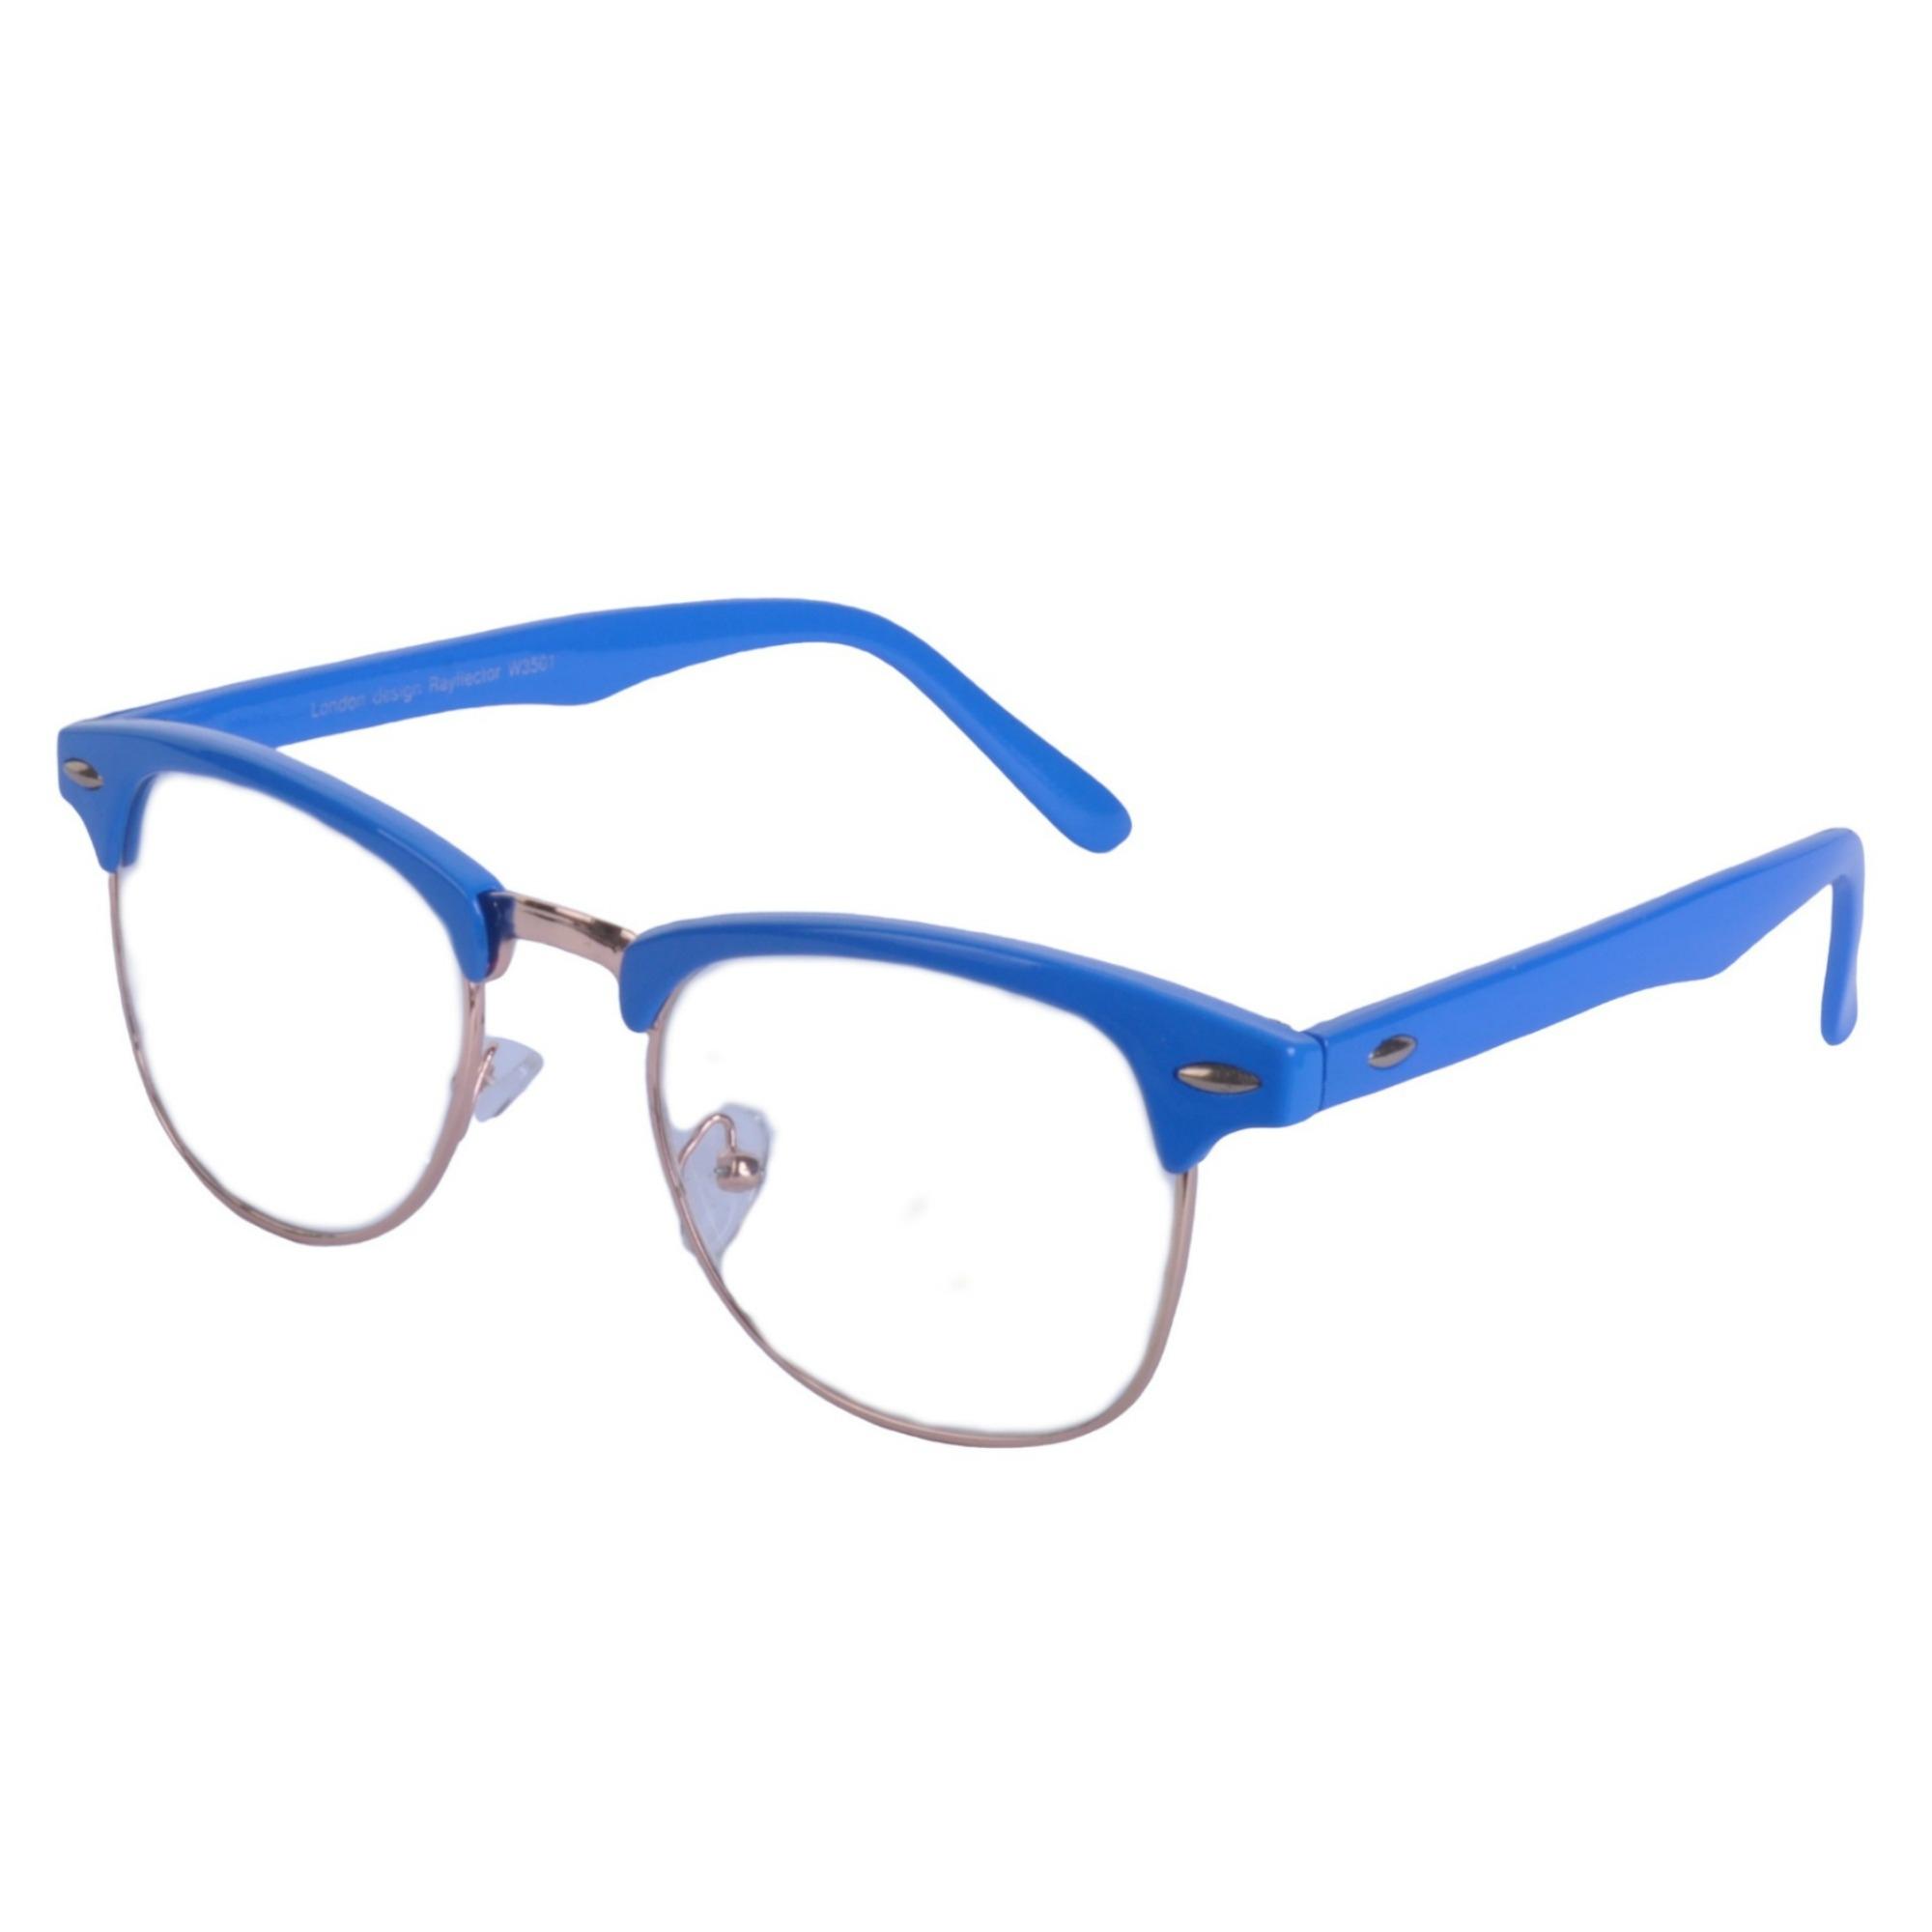 Vintage-Lente-Transparente-Cejas-Barra-Gafas-Gafas-de-Sol-Hron-Borde-Negro miniatura 9